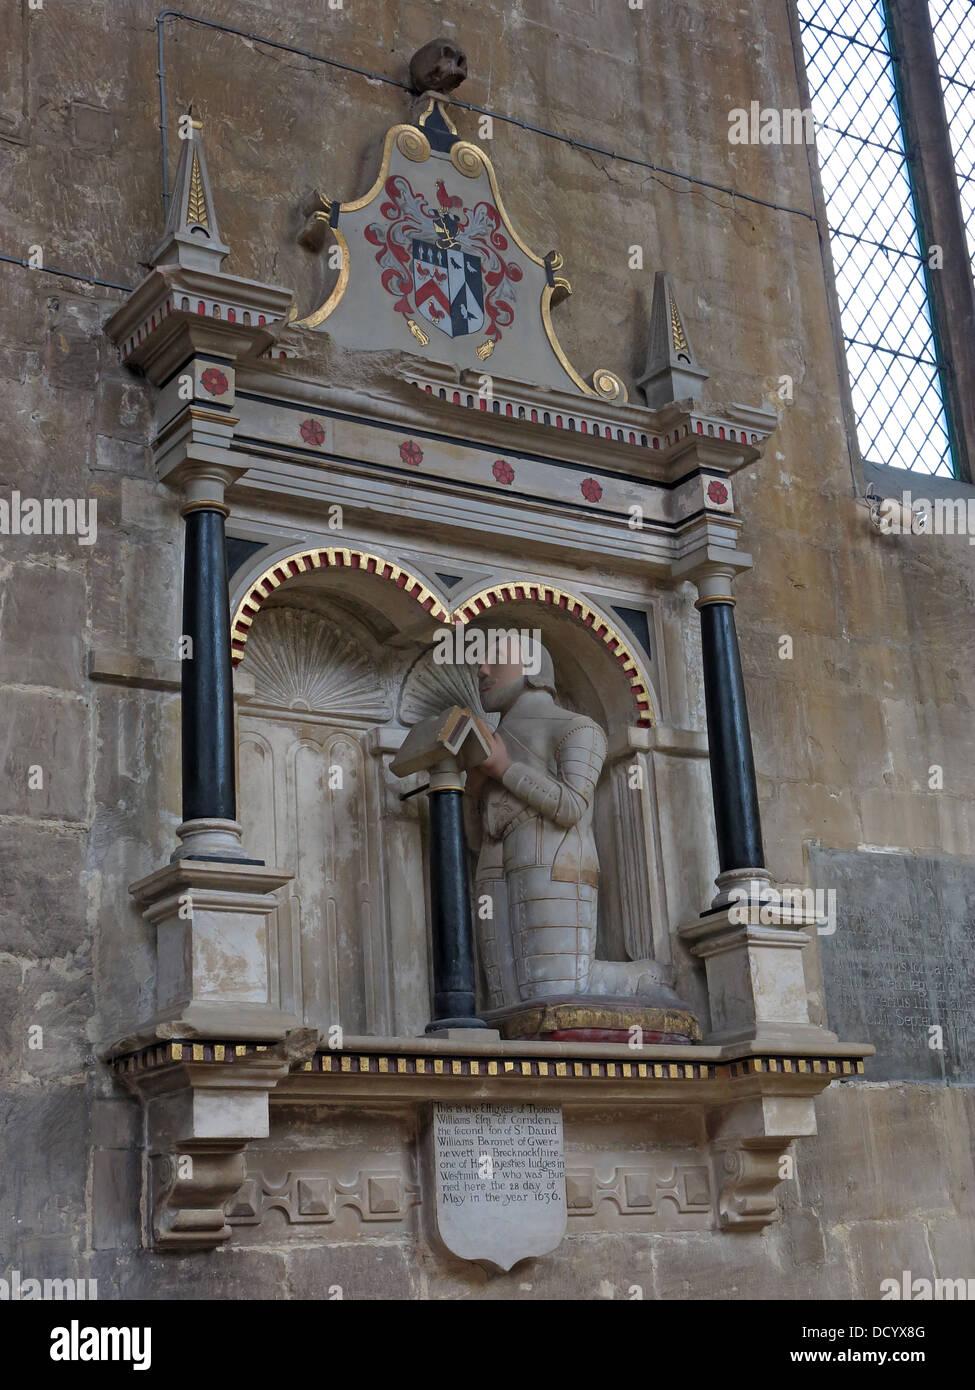 Stone Effigy of Tom Wiliams, St Peters Church, Cheltenham, Gloucester, England, UK - Stock Image